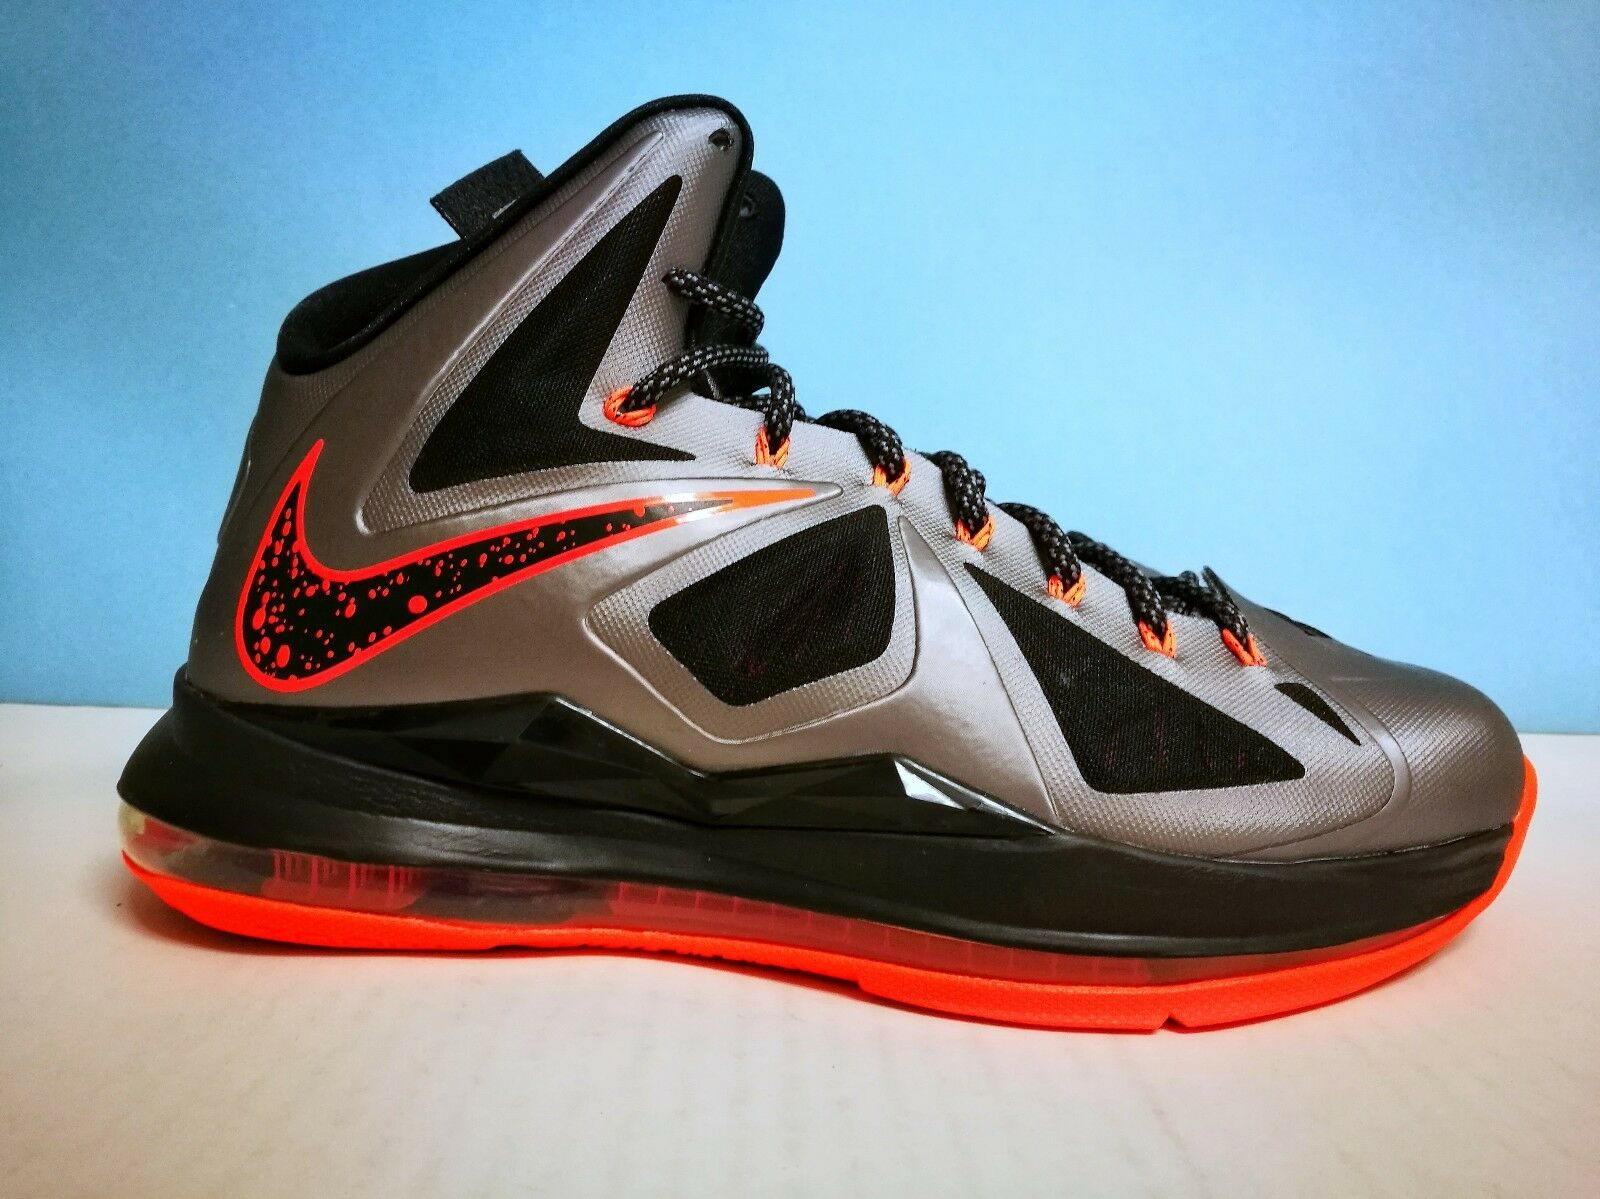 Nike Lebron X (10) ++ US LAVA ++ sz 9 US ++ 42.5 EU 541100 002 Jordan kobe kd Adidas fb9664